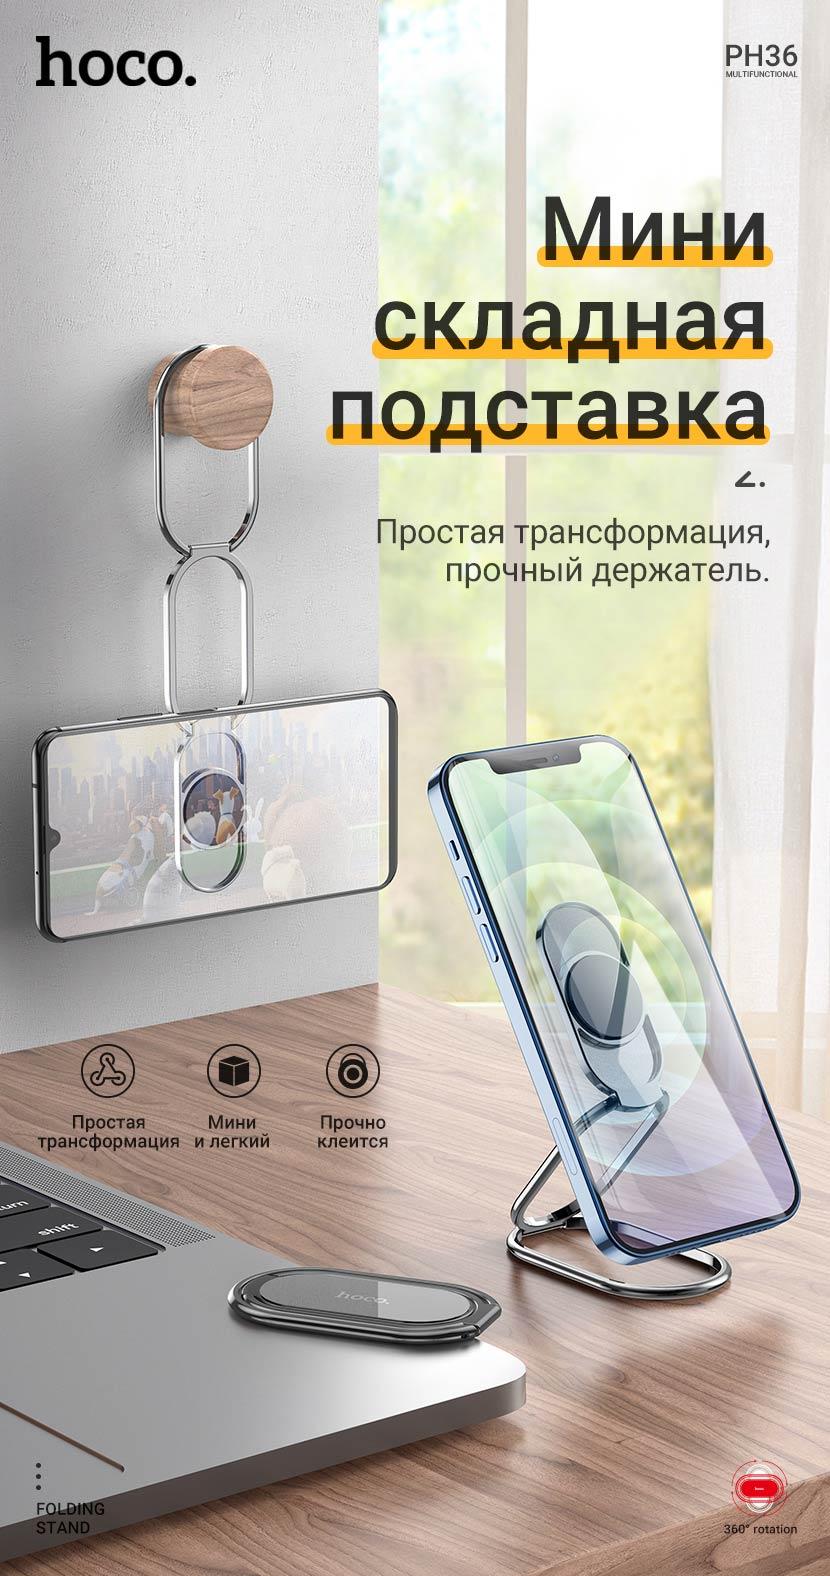 hoco news ph36 emma metal multifunctional folding stand ru